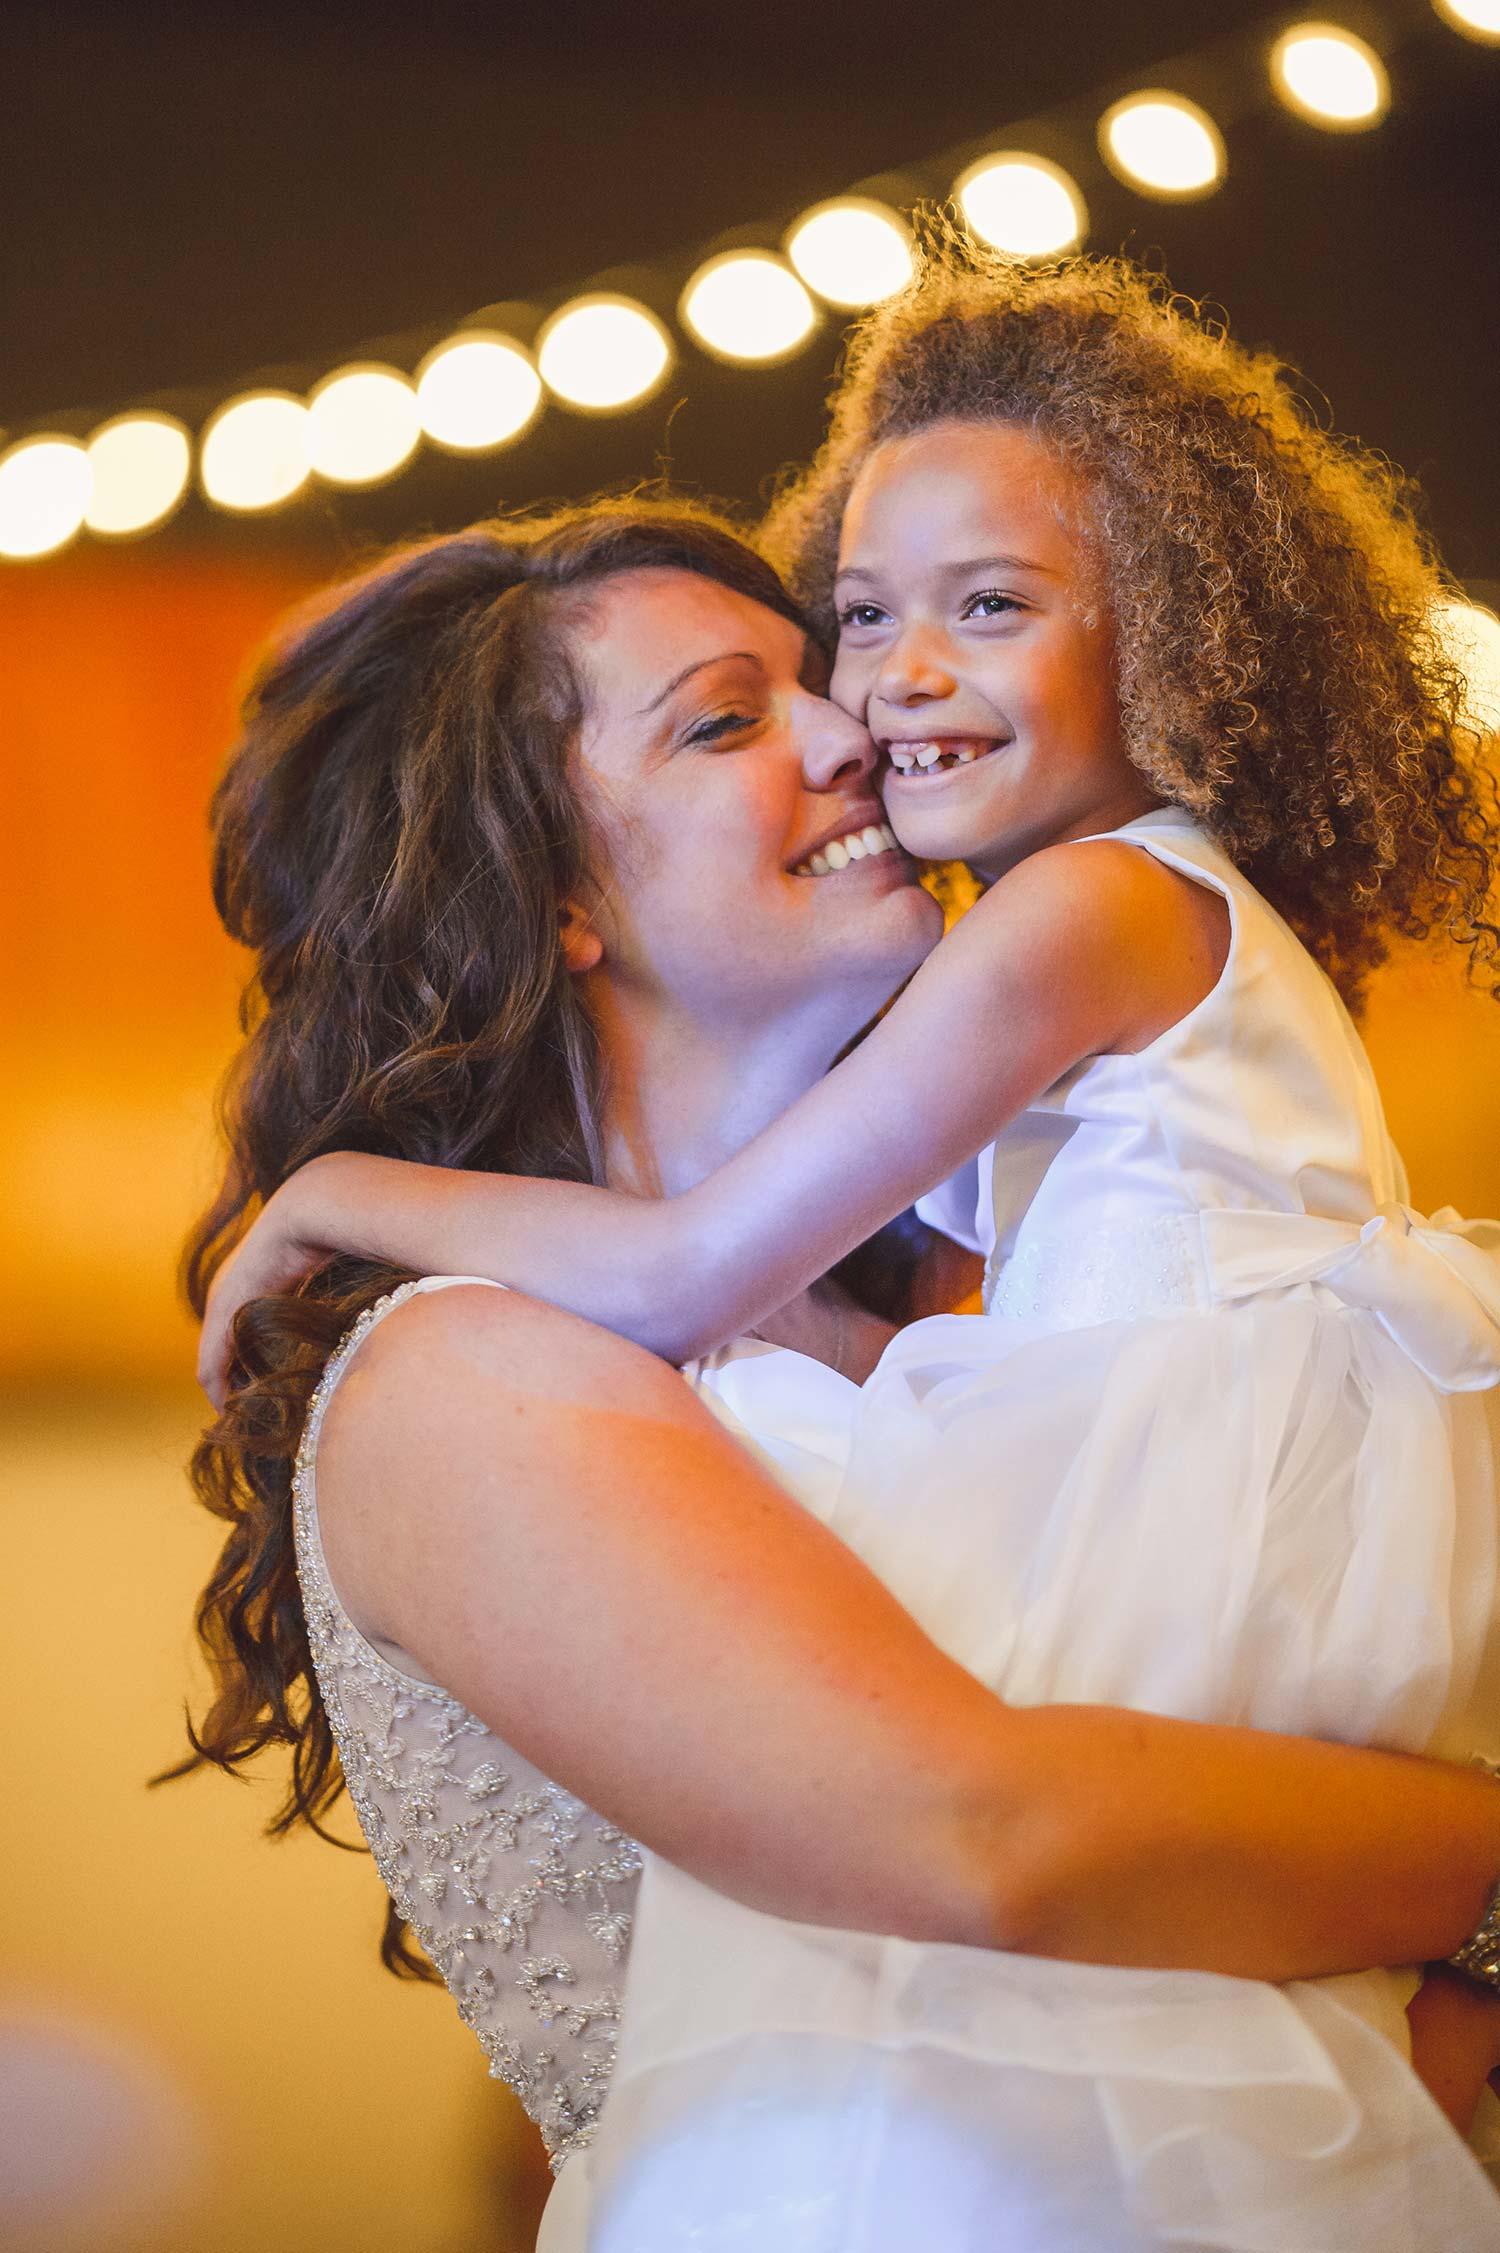 mother-daughter-dance-wedding-reception.jpg